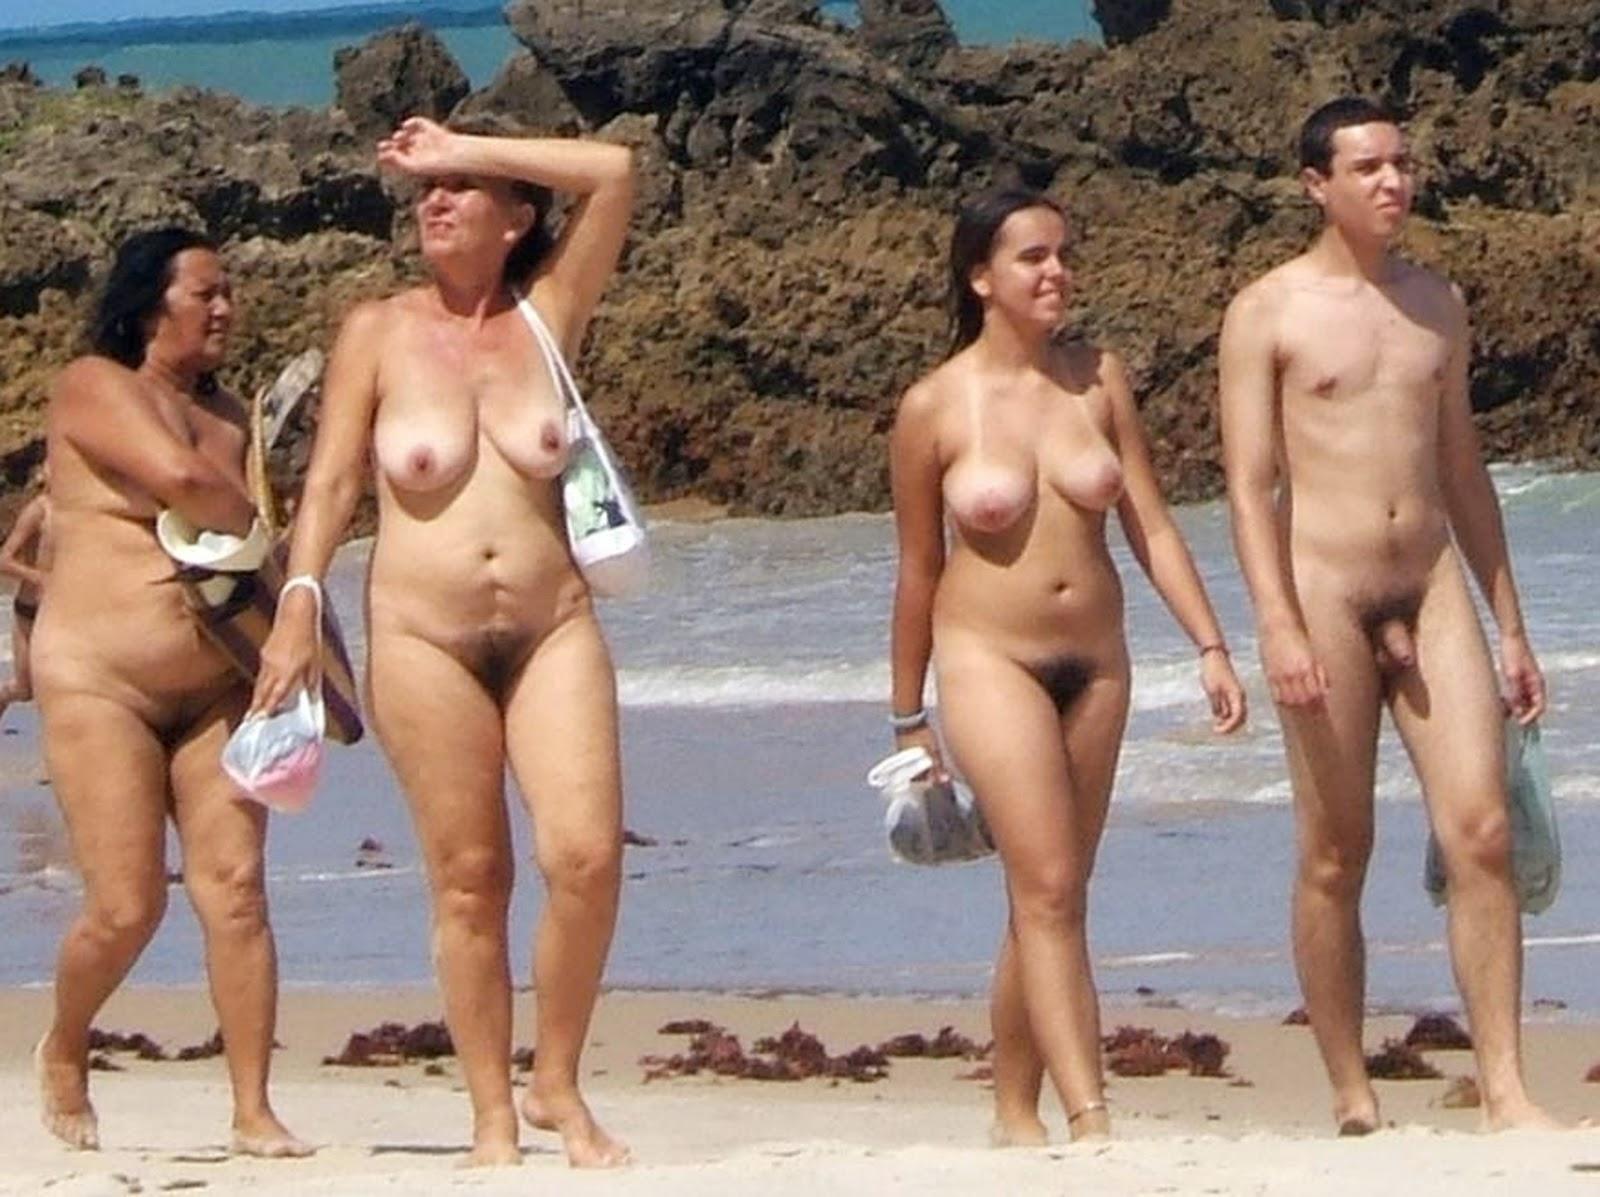 puna hot girls hairy nudi image